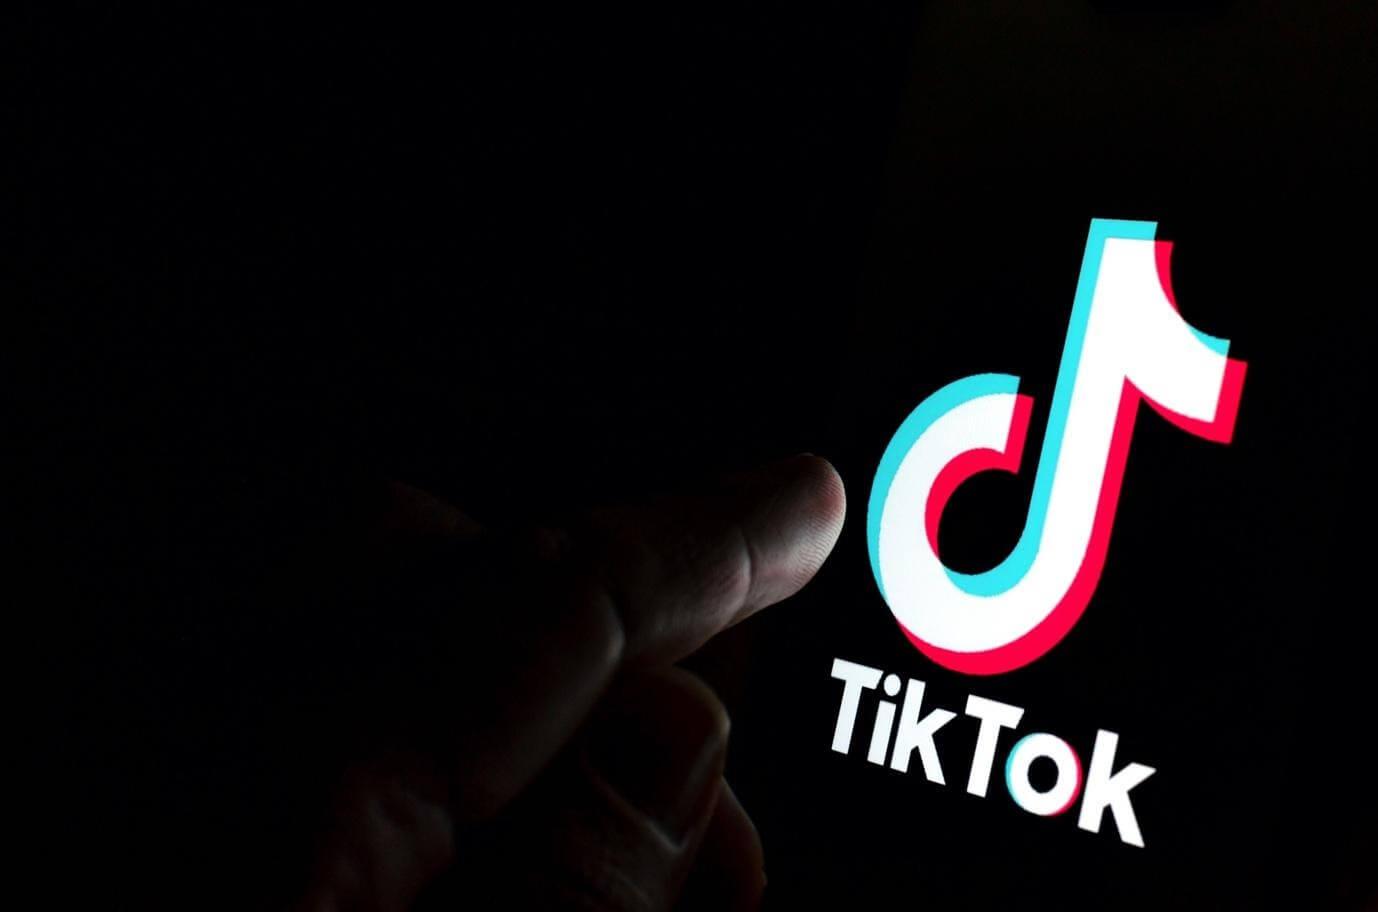 Chinese Giant TikTok Has Passed 1 Billion Monthly Users